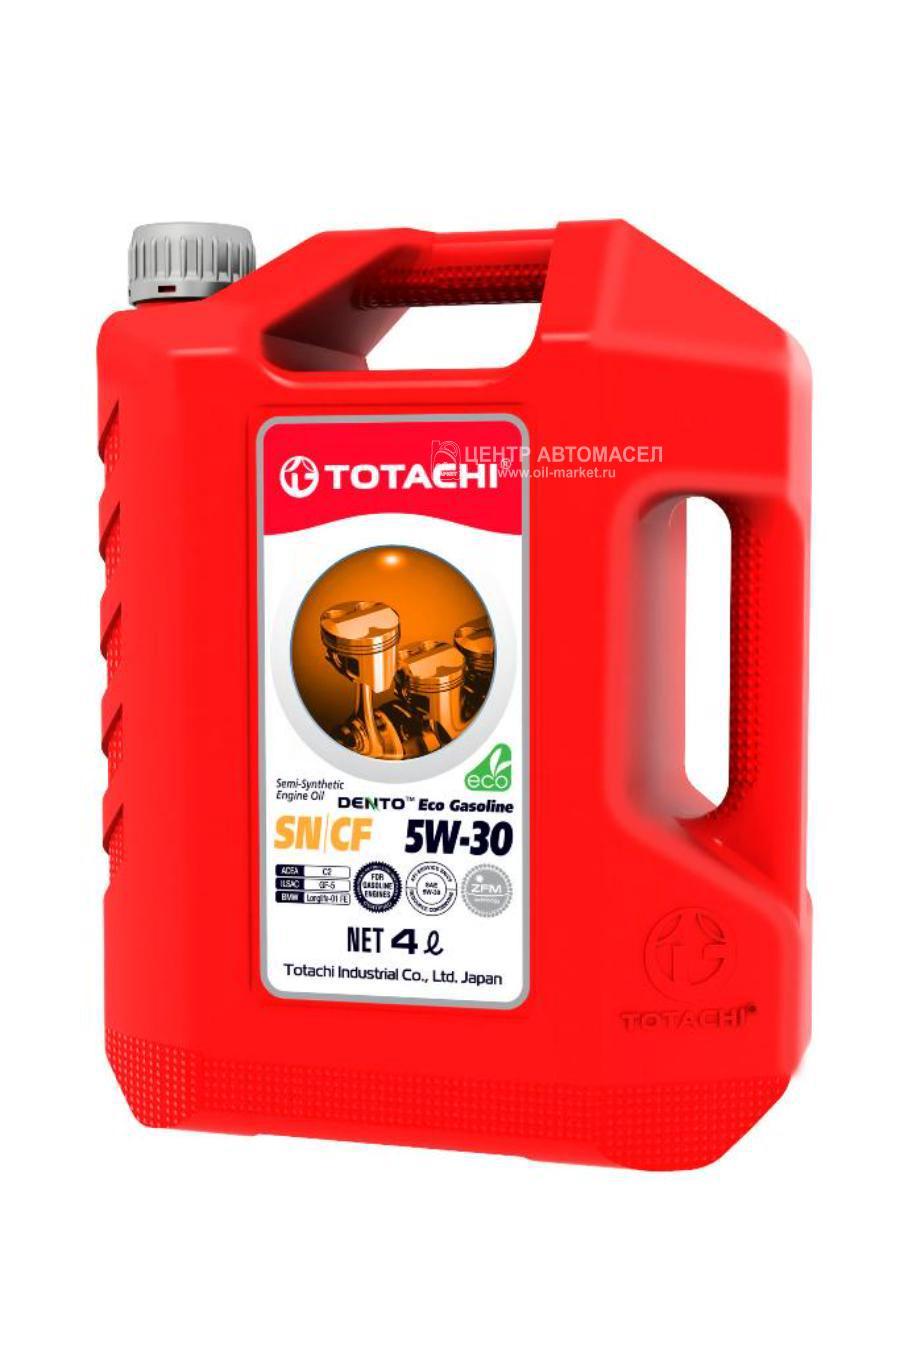 TOTACHI DENTO Eco Gasoline Semi-Synthetic API SN/CF 5W30 4л пласт.канистра